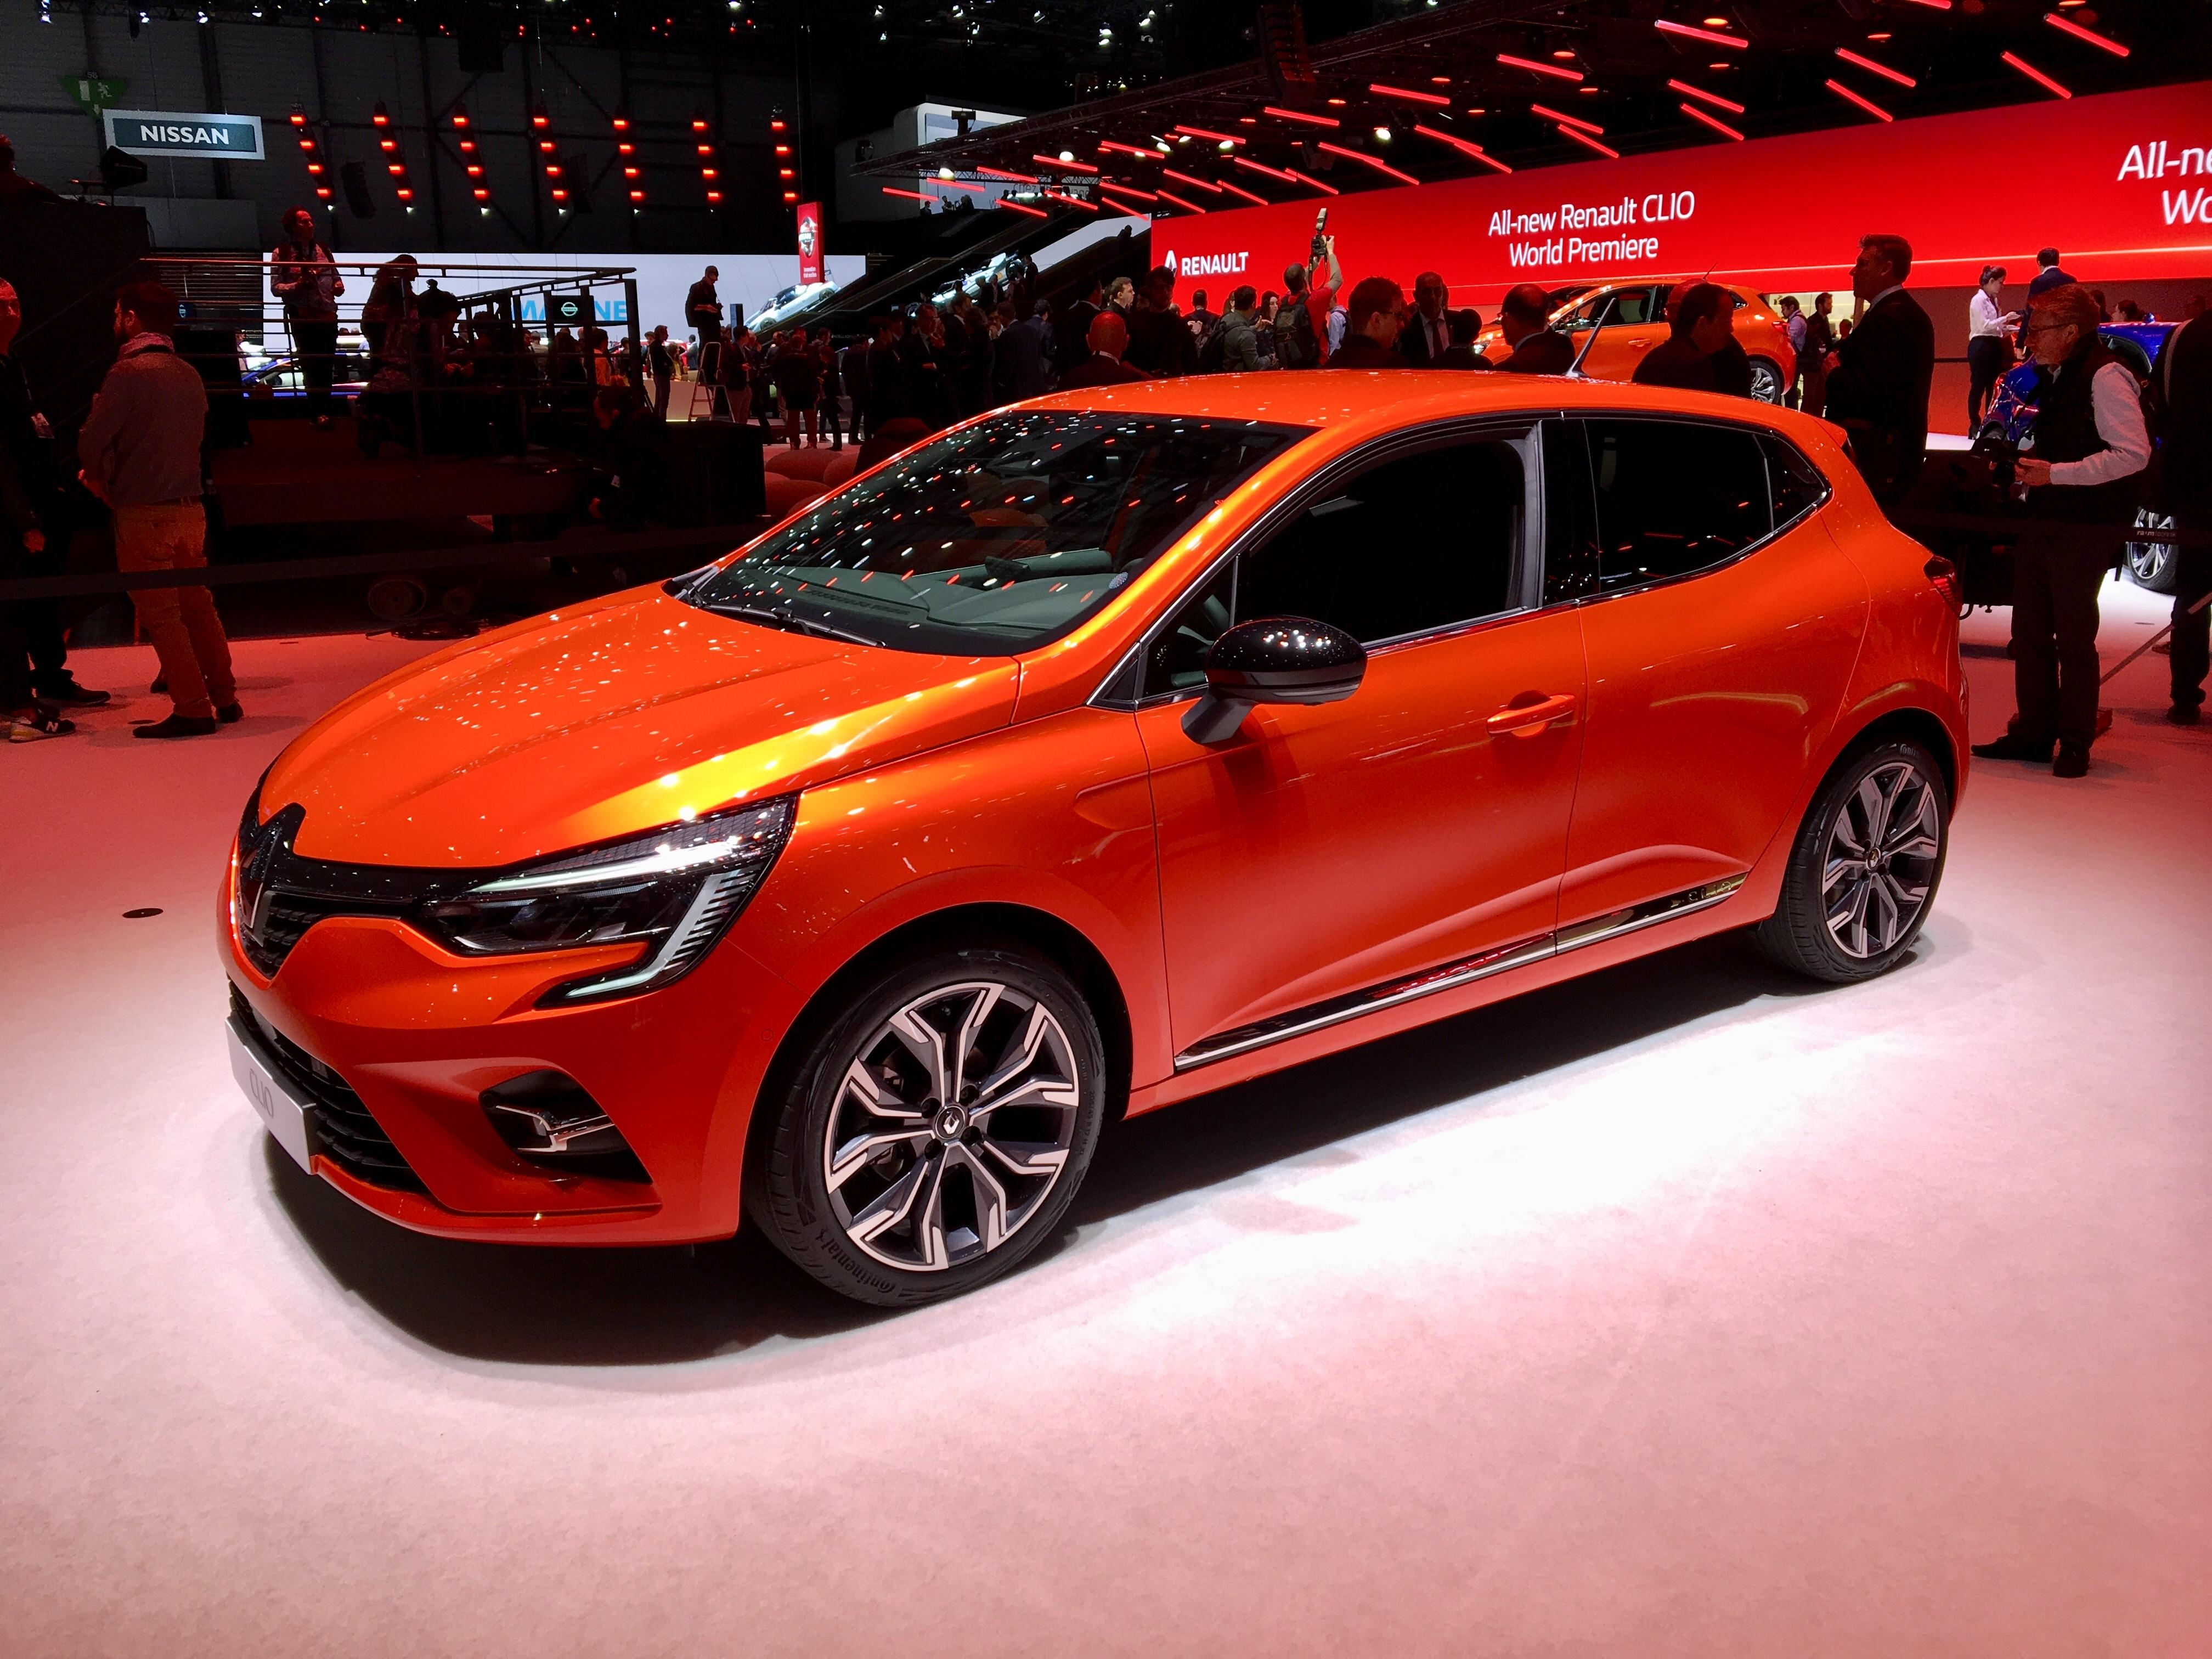 Renault Clio V La Nouvelle Star Vid 233 O En Direct Du